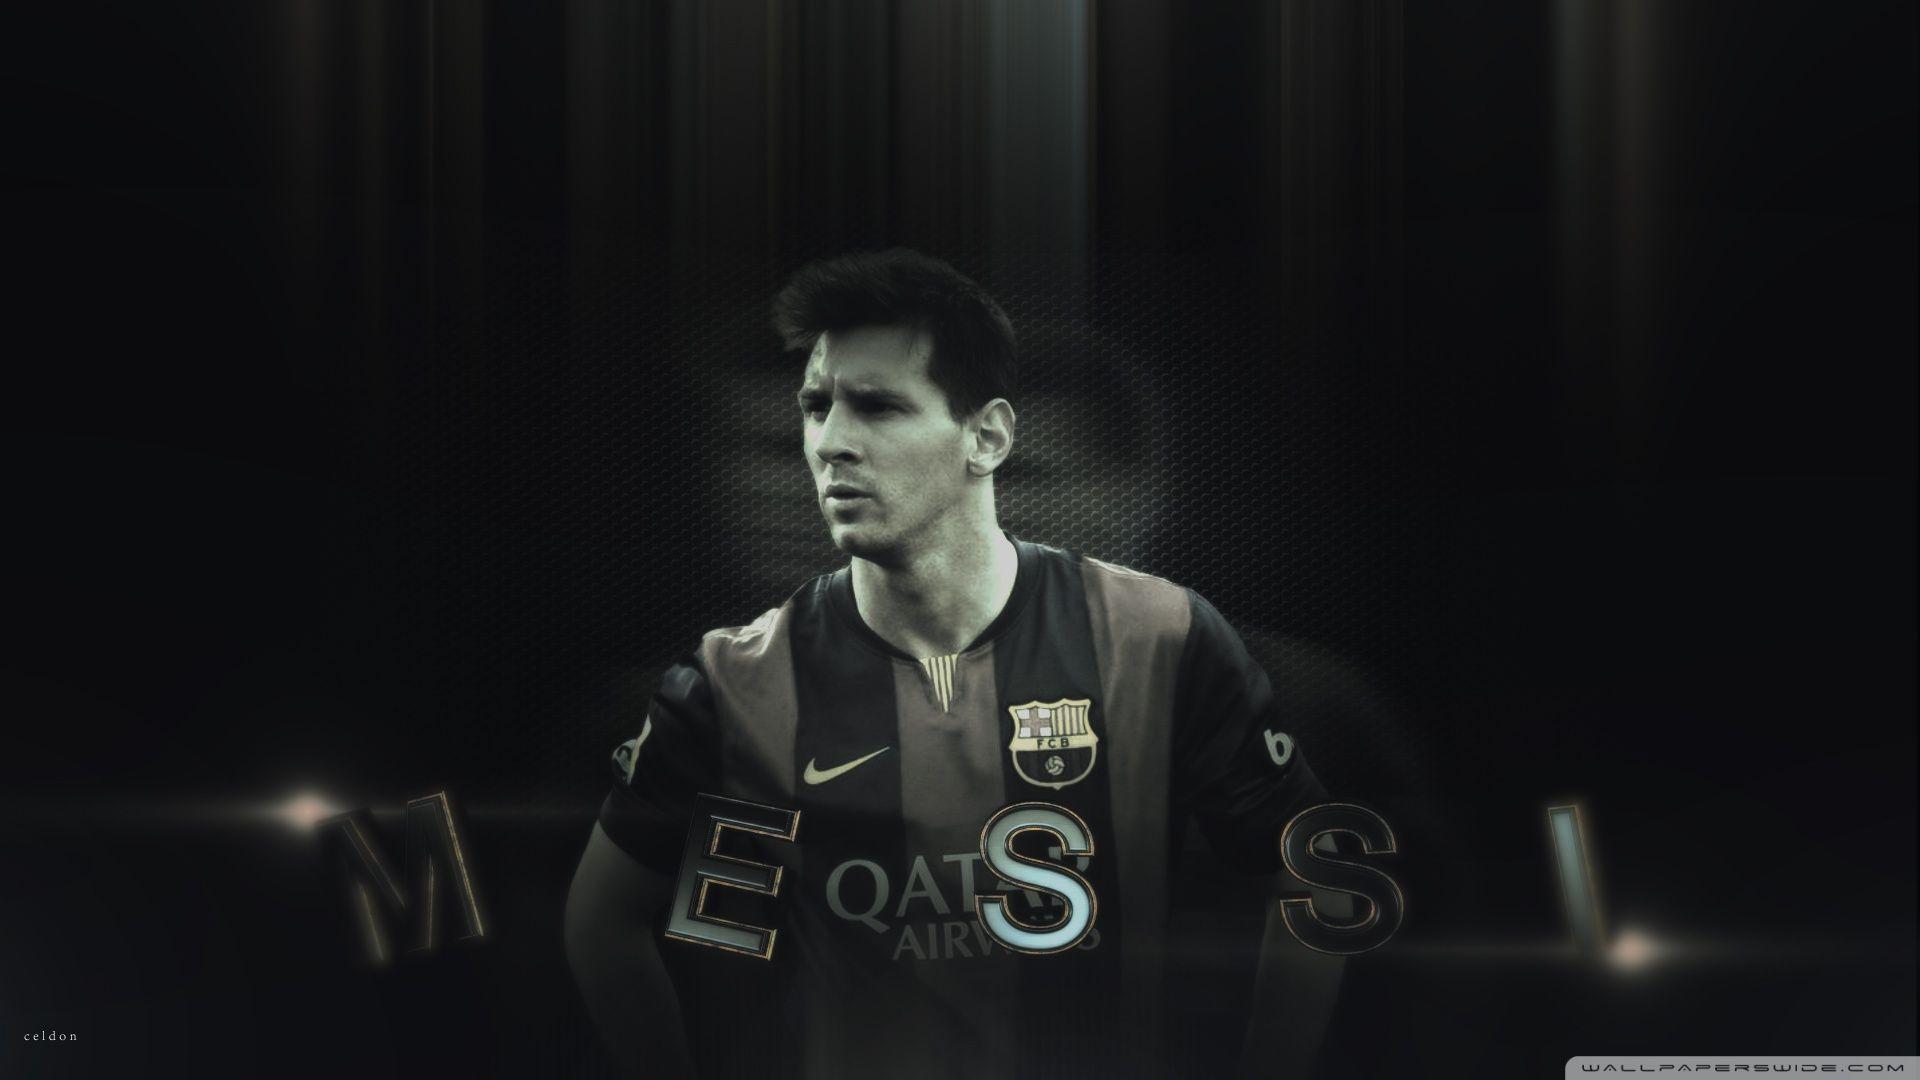 Balón De Fútbol 1920x1080 Hd: Lionel Messi 2016 Wallpapers HD 1080p